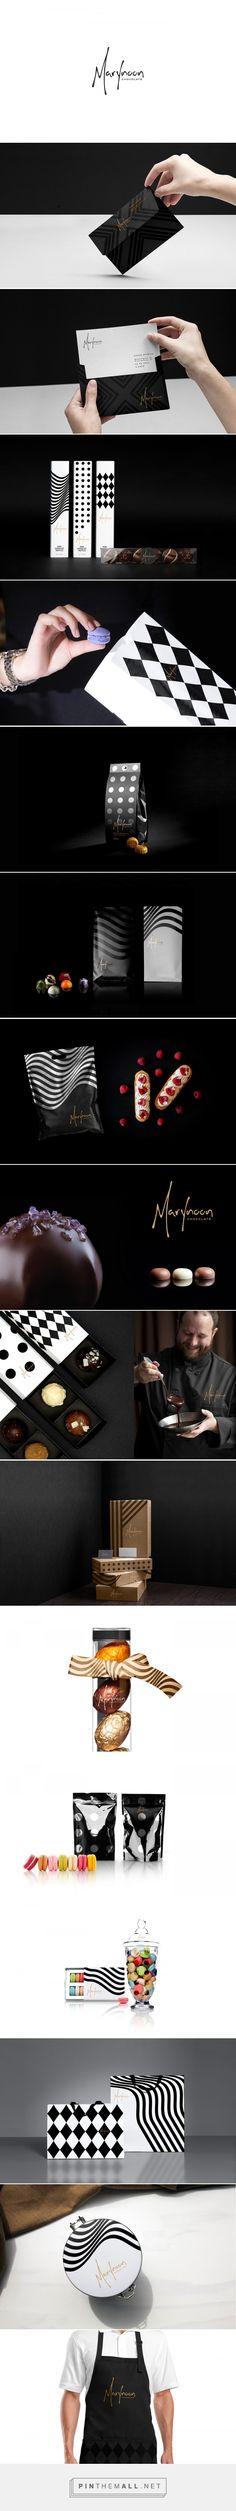 Marynoon Chocolate Branding and Packaging by Abdulaziz Aljafen | Fivestar Branding Agency – Design and Branding Agency & Curated Inspiration Gallery